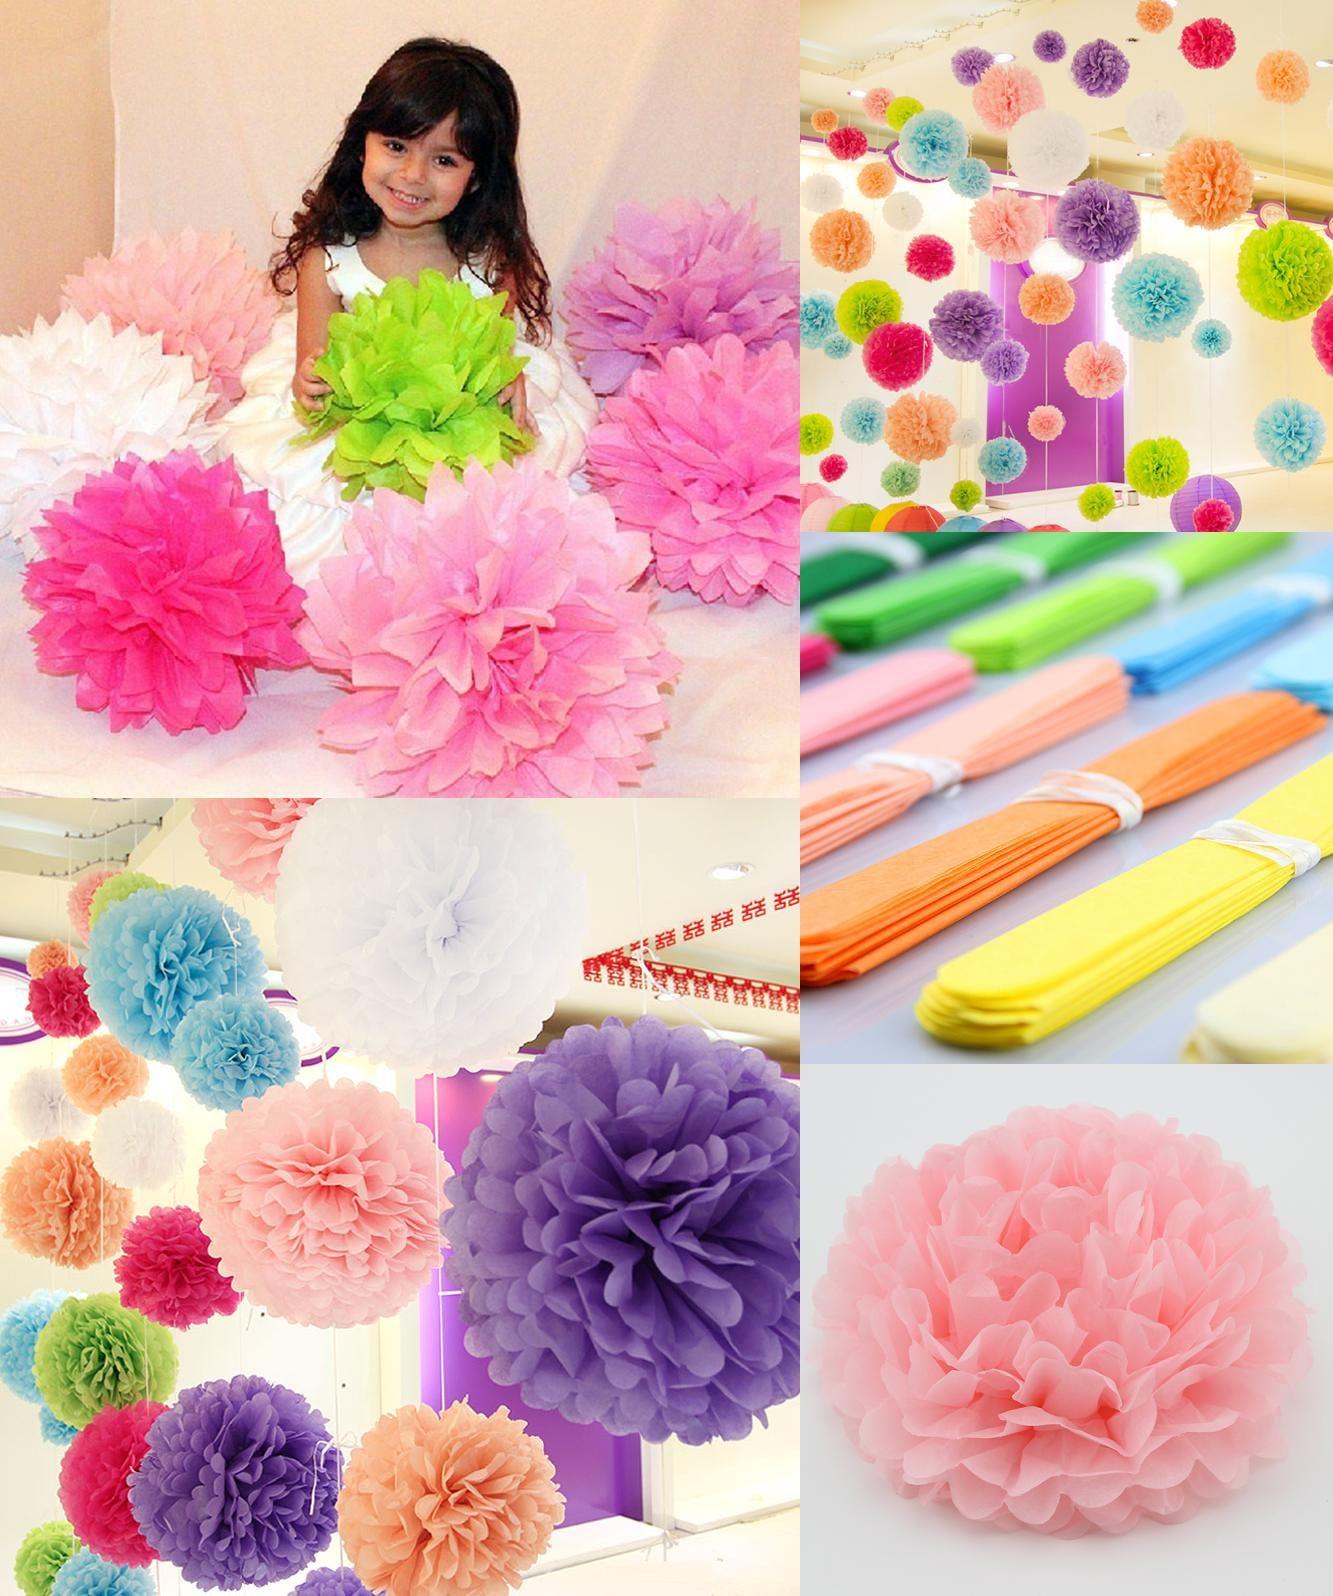 Visit To Buy 1pcs 6 14 Inch 1520253035cm Tissue Paper Pom